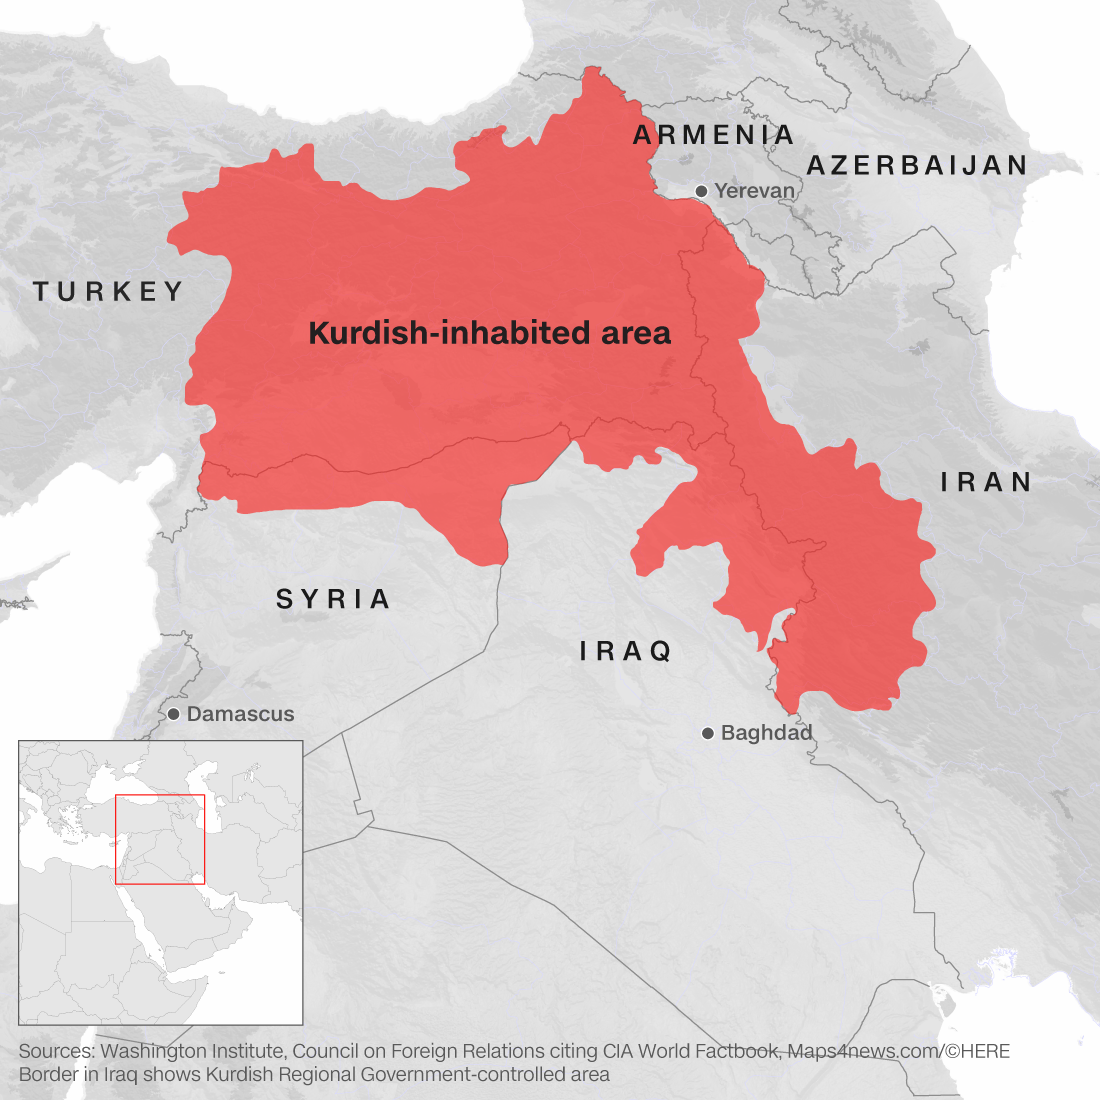 Women. Life. Freedom. fighters of Kurdistan - CNN on israel world map, turkey world map, nyc world map, scotland world map, balkans world map, lebanon world map, serbia world map, golan heights world map, mali world map, germany world map, rwanda world map, gaza on world map, south ossetia world map, palestine world map, george world map, kobani world map, taiwan world map, iceland world map, kazakhstan world map, chad world map,